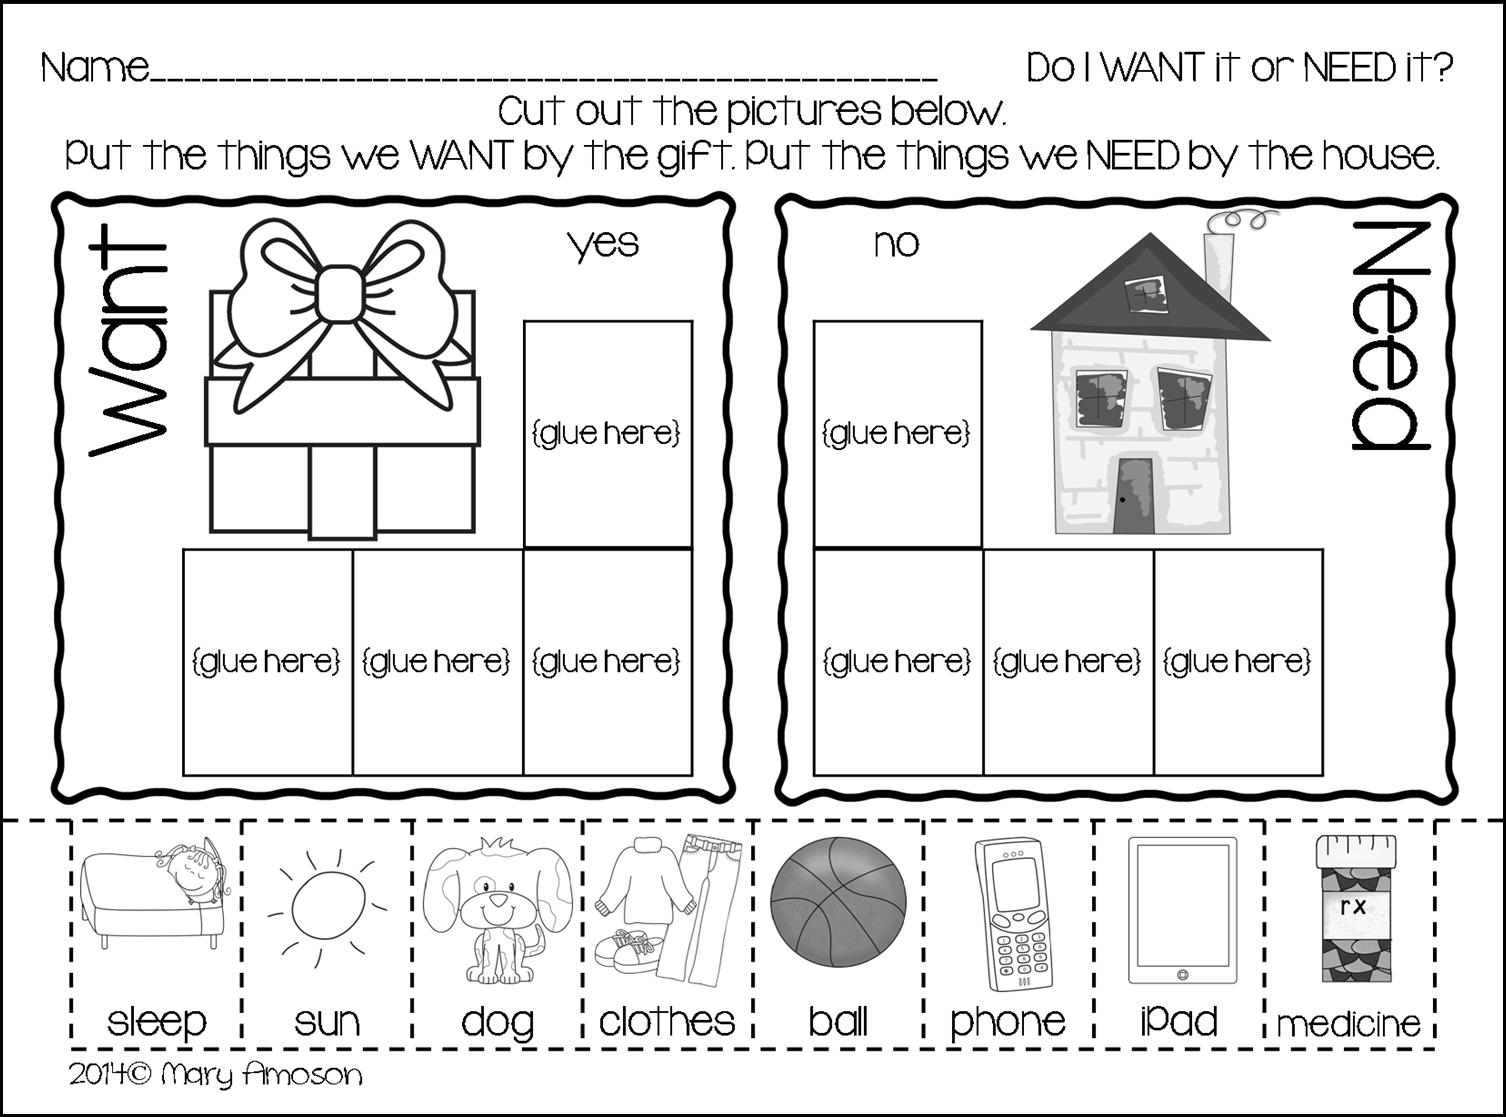 http://www.sharingkindergarten.com/2014/12/wants-and-needs-with-freebie.html